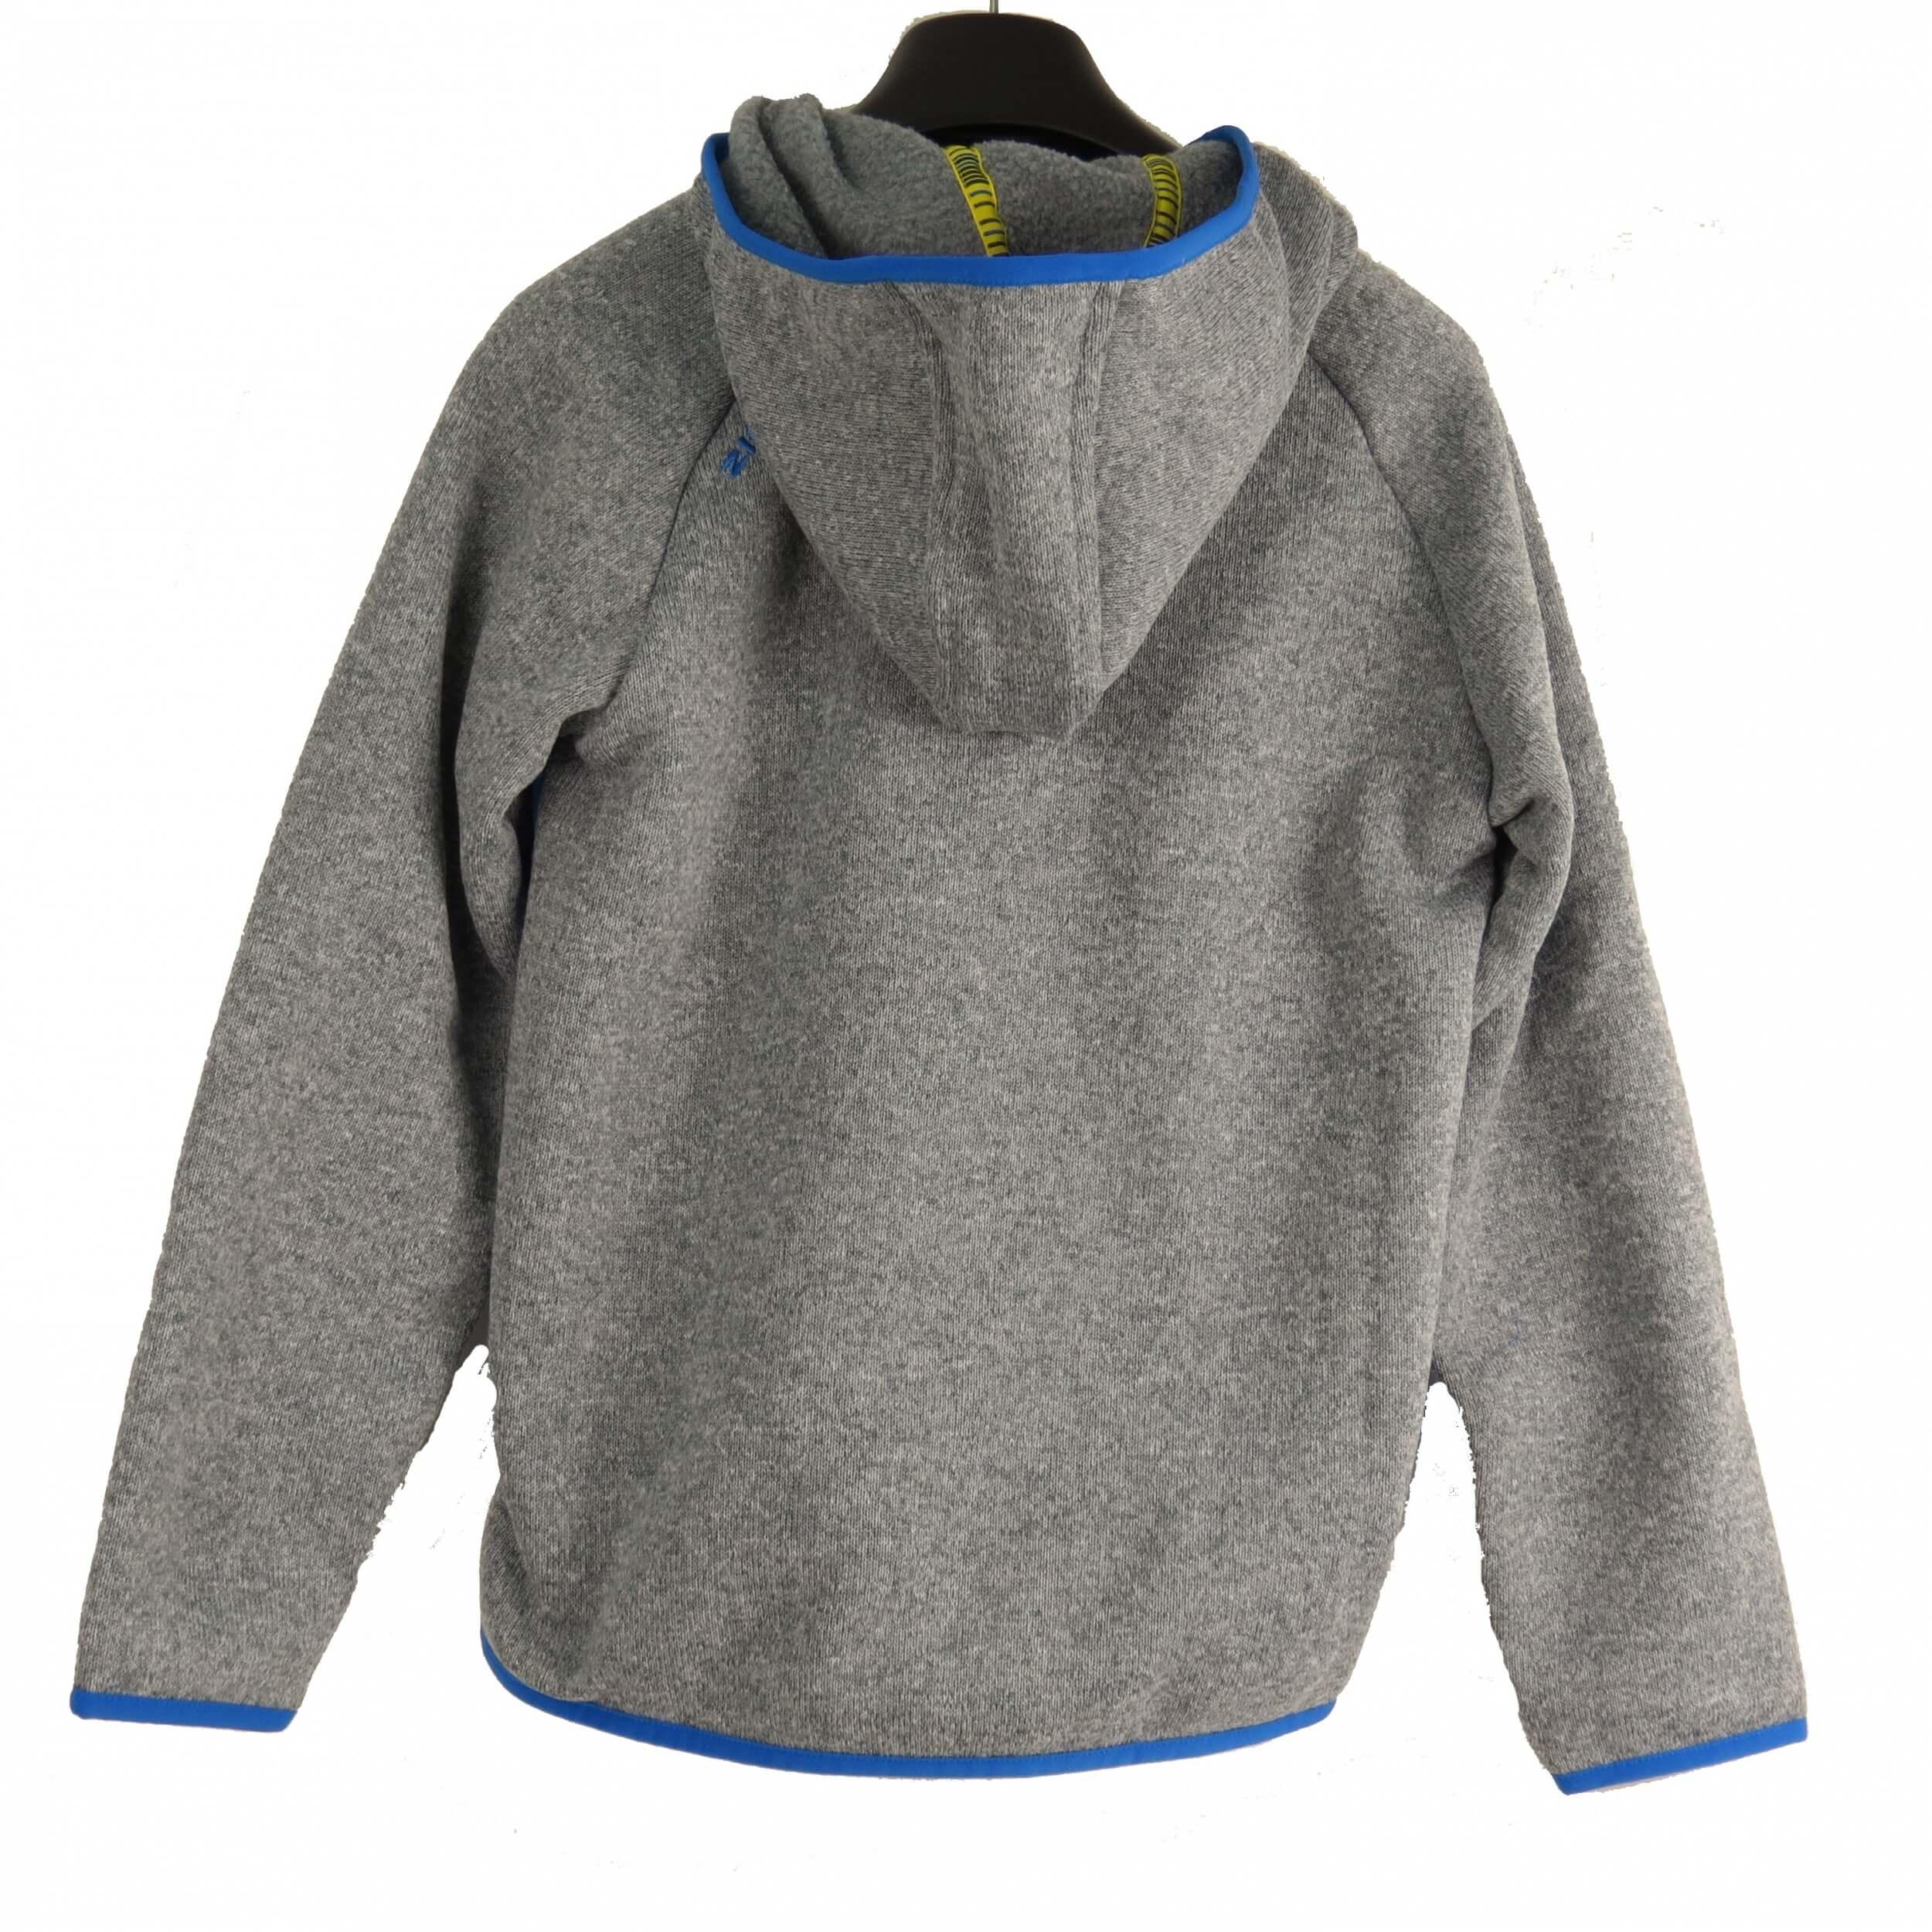 ZIENER Kinder Jacke Jamar blau 798